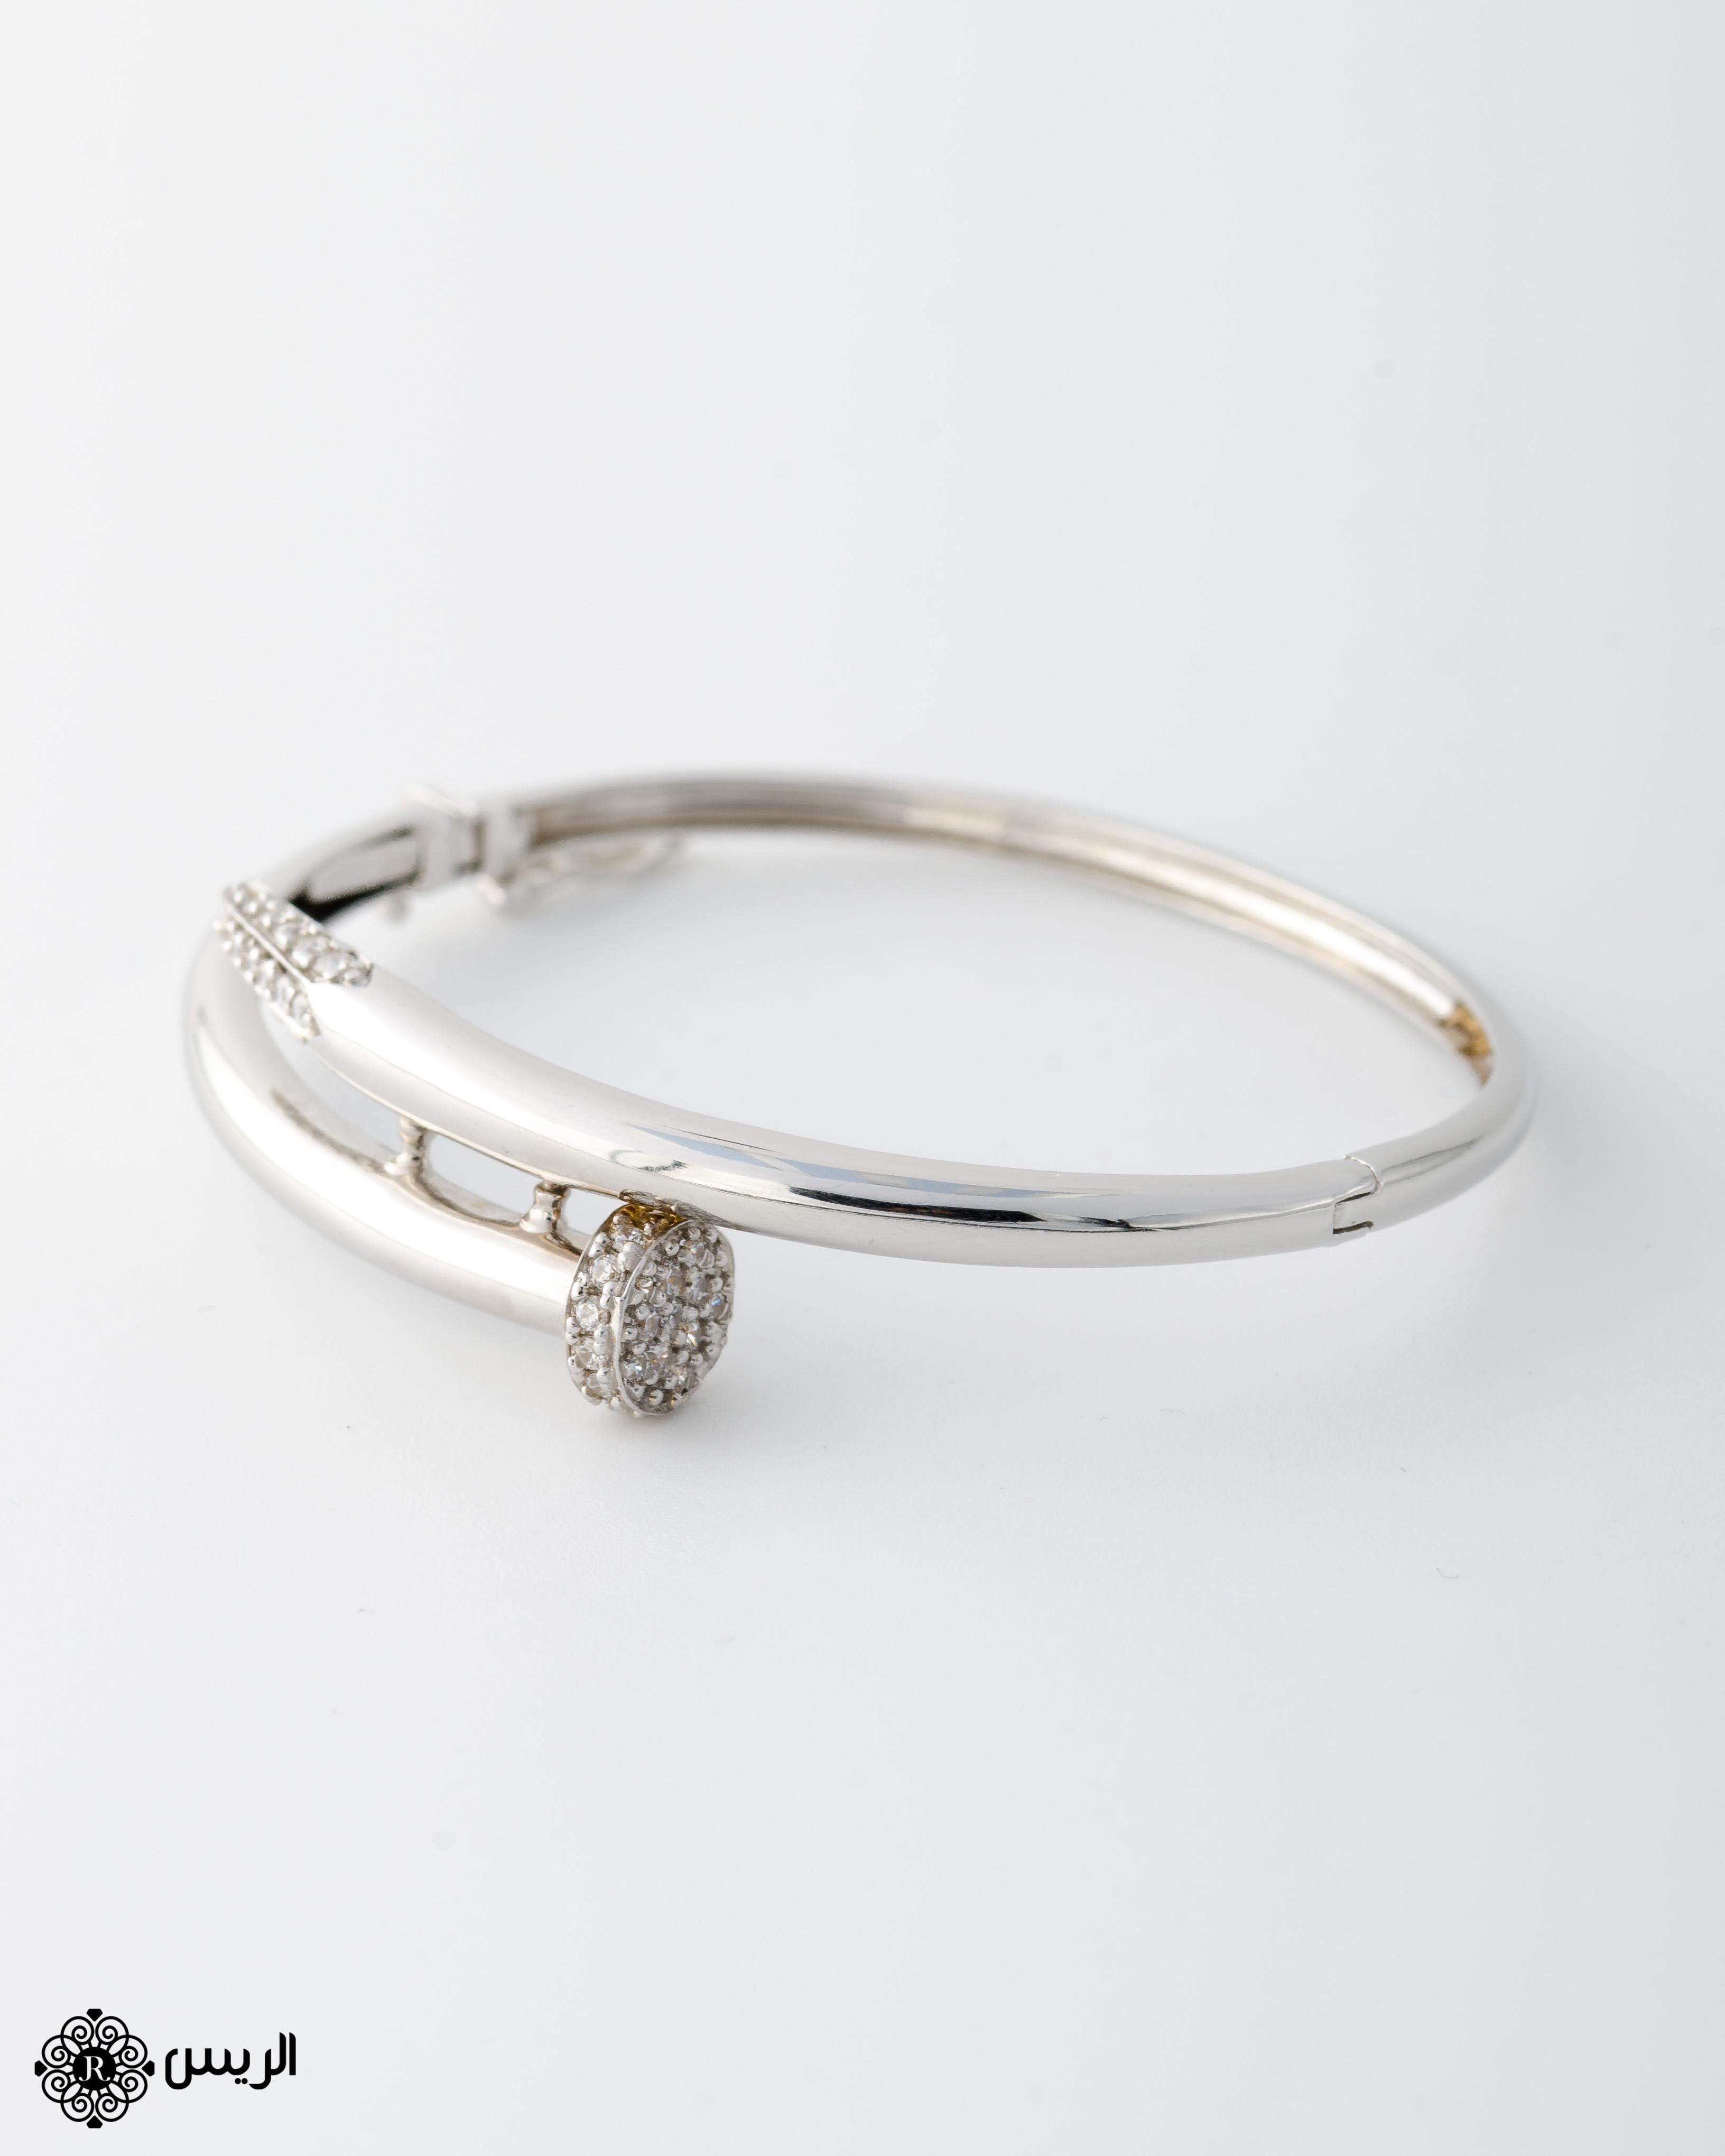 Raies jewelry Bangle Nail Casual Design إسورة مسمار تصميم سبور الريس للمجوهرات